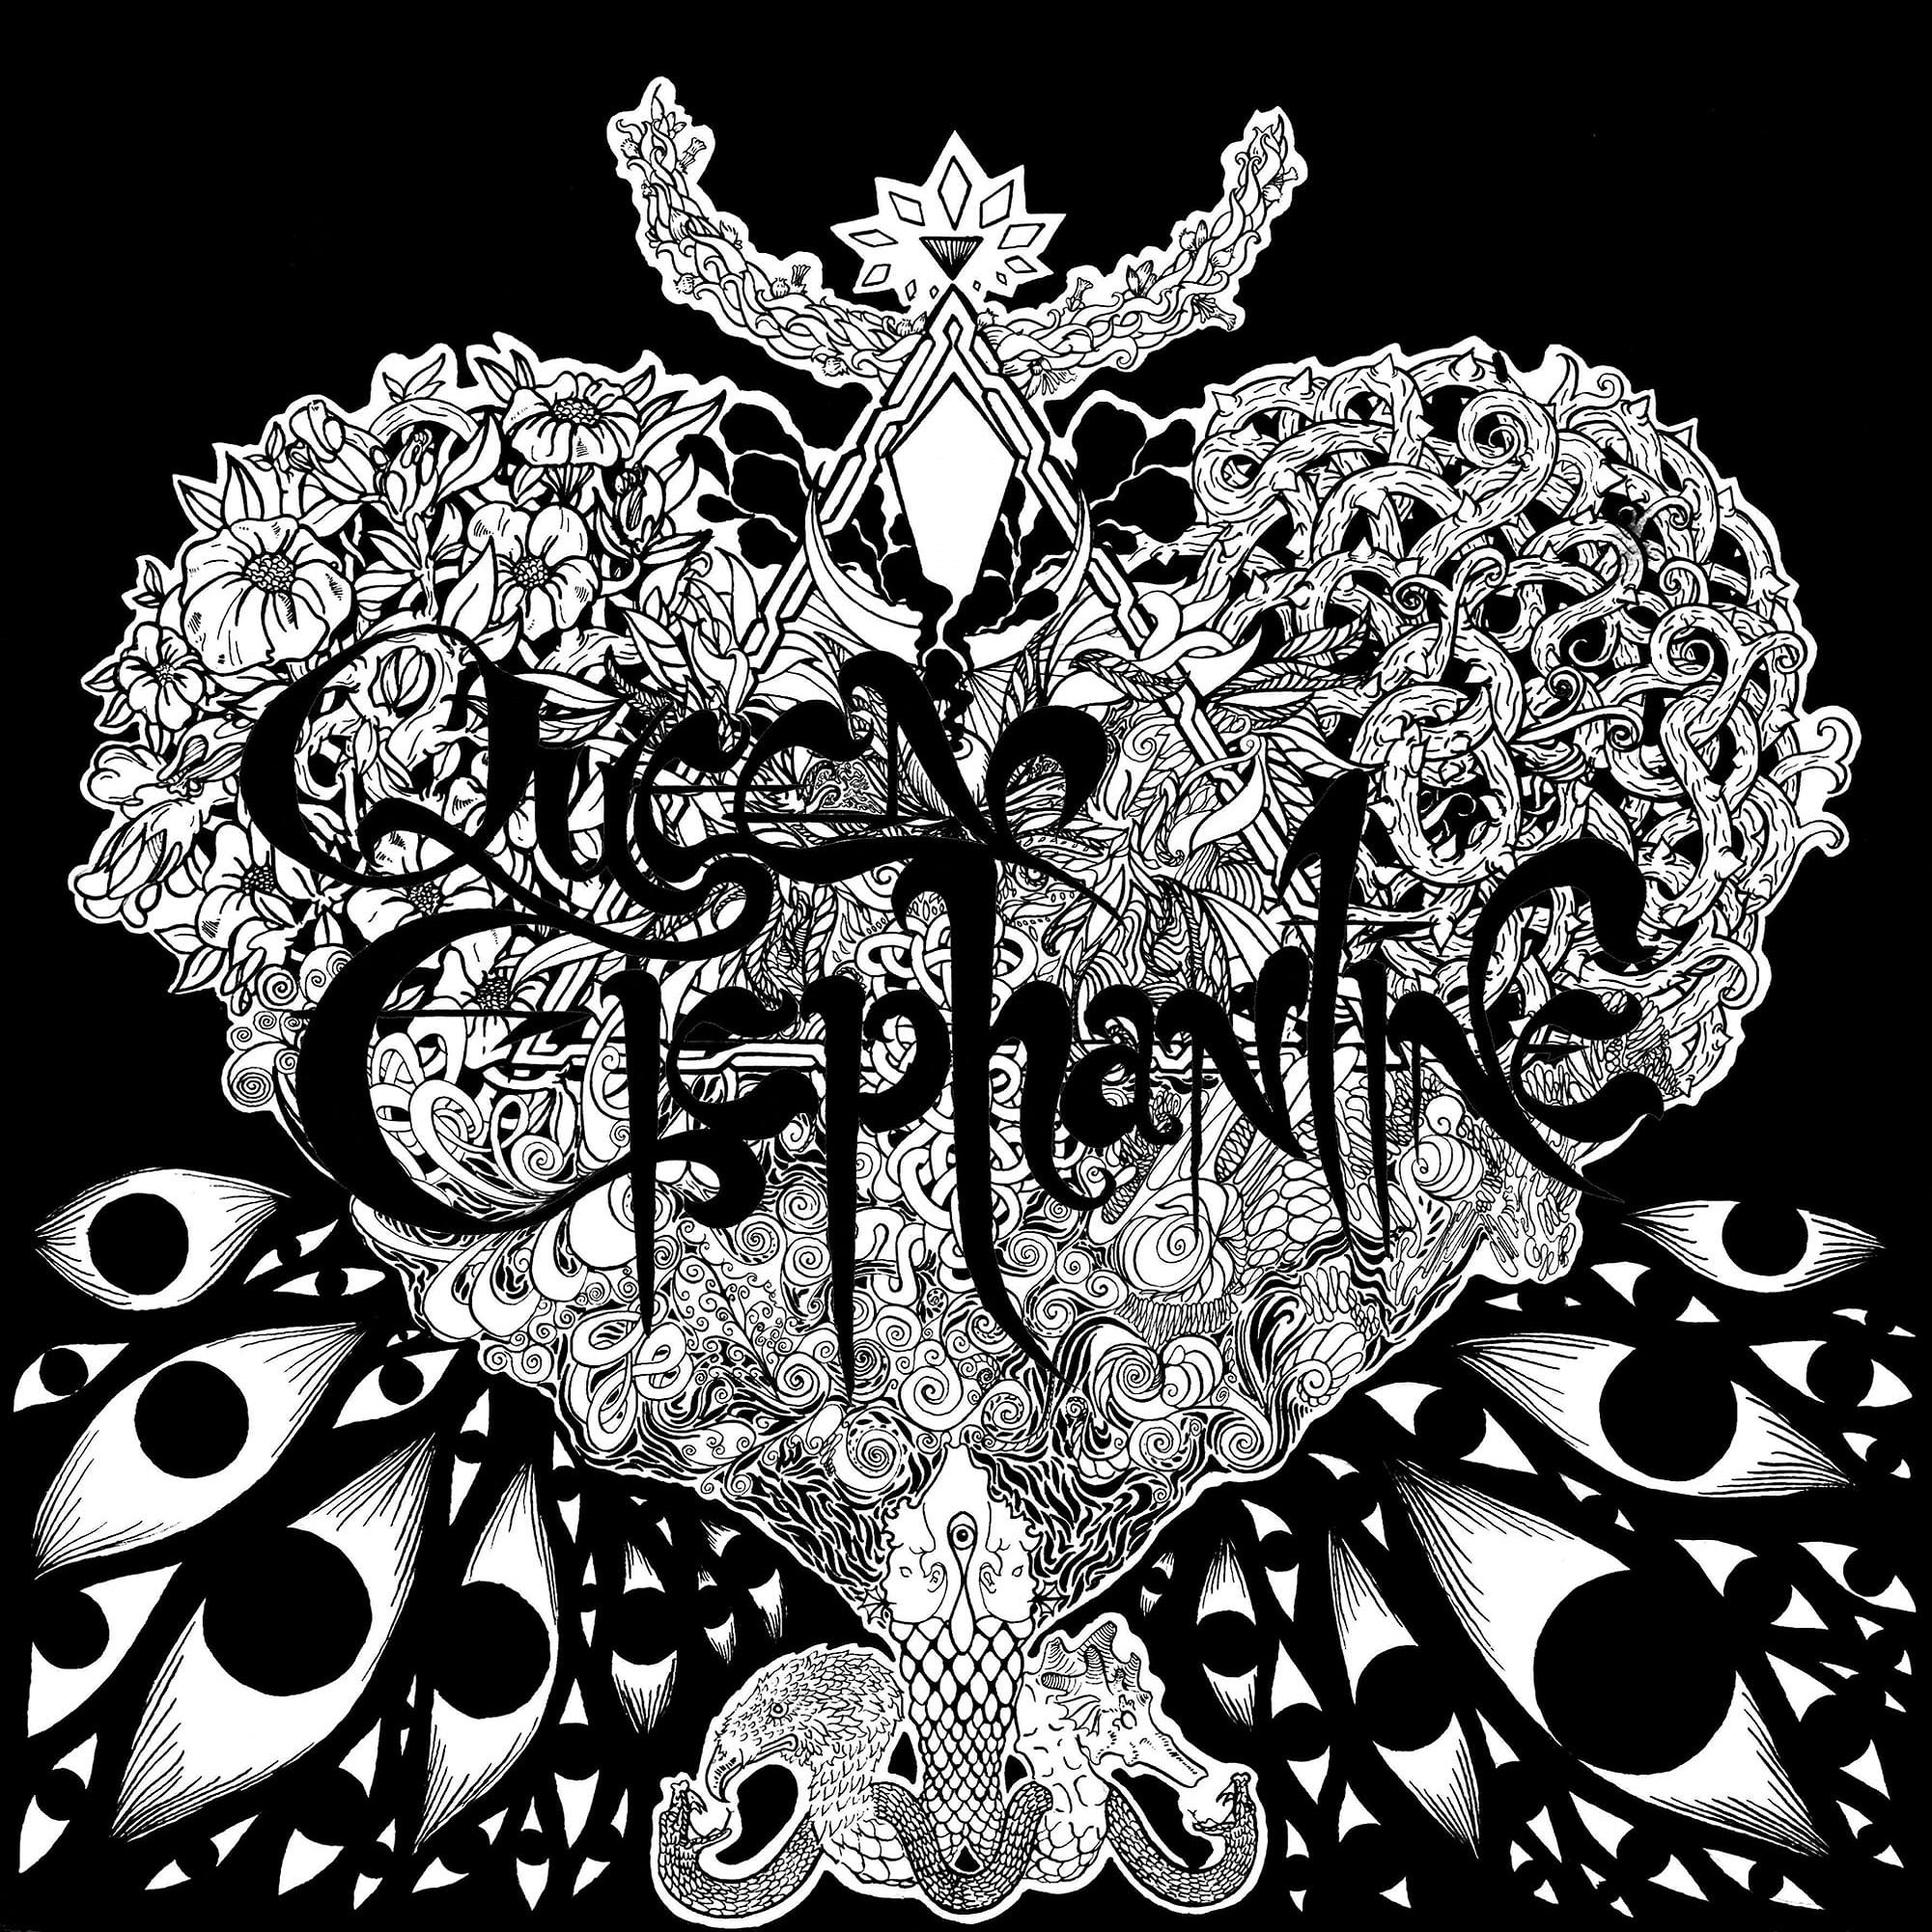 queen elephantine gorgon art preview